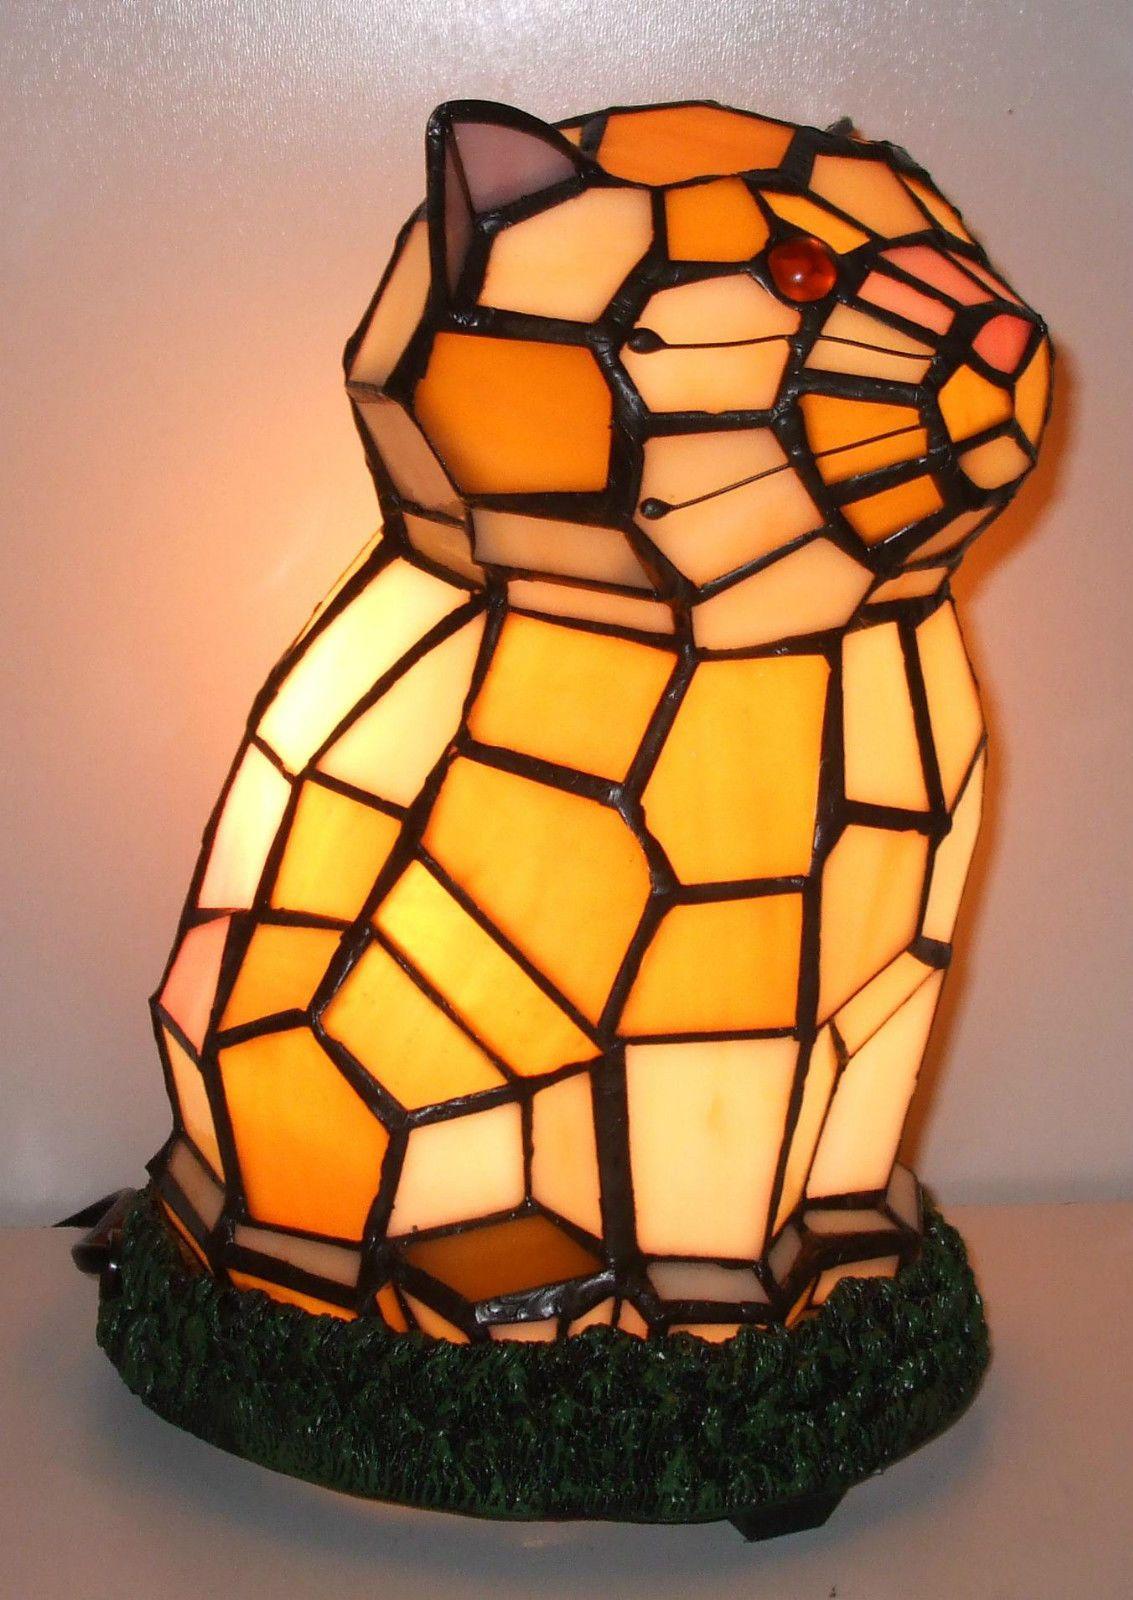 Loxton Lighting 19 Cm Tiffany Cat Table Lamp Multi Colour